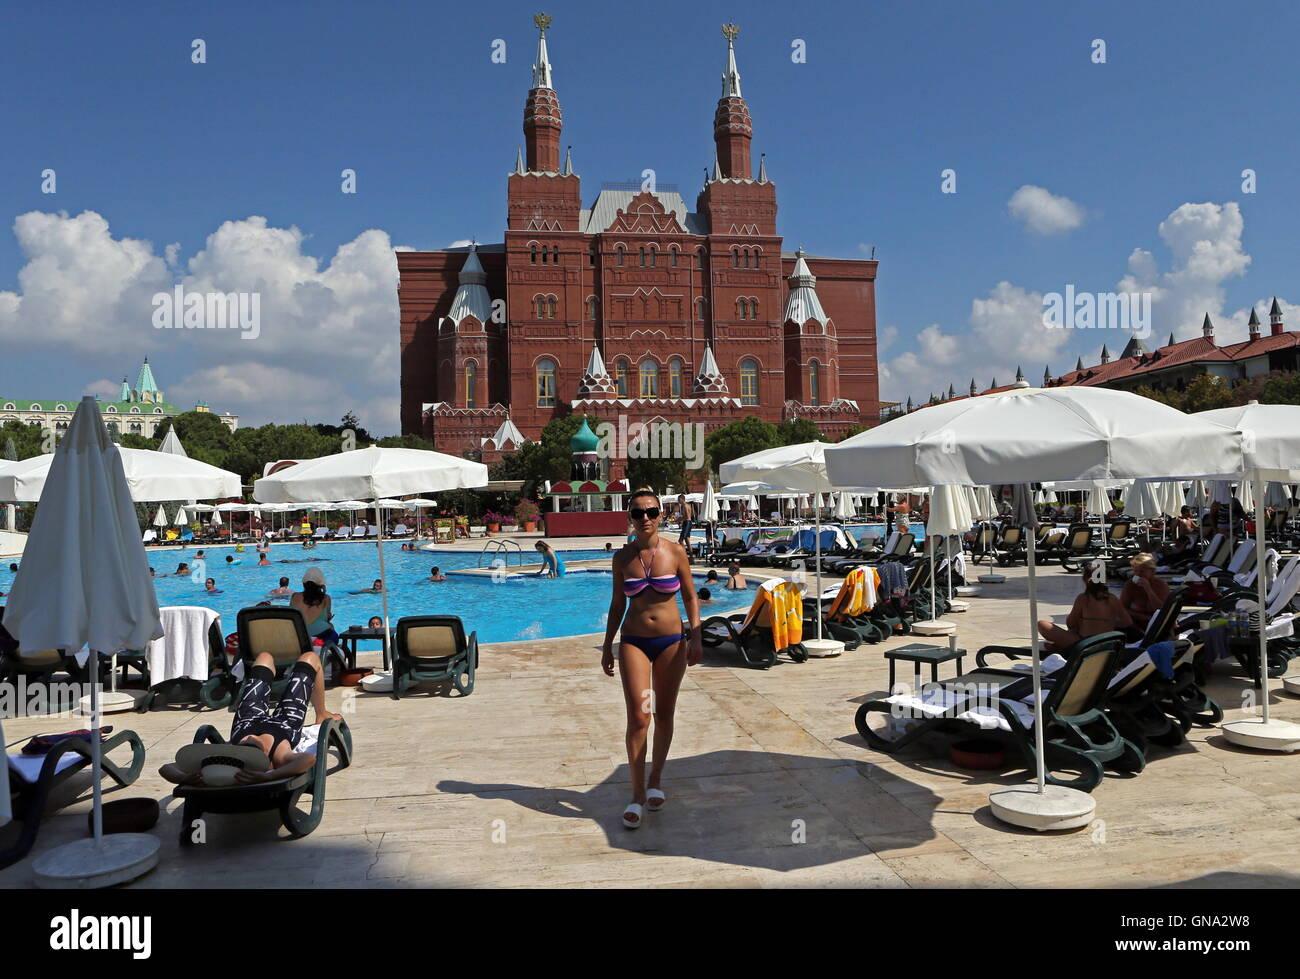 antalya turkey august 29 2016 holidaymakers at the kremlin palace hotel in the mediterranean resort of antalya russias federal air transport agency